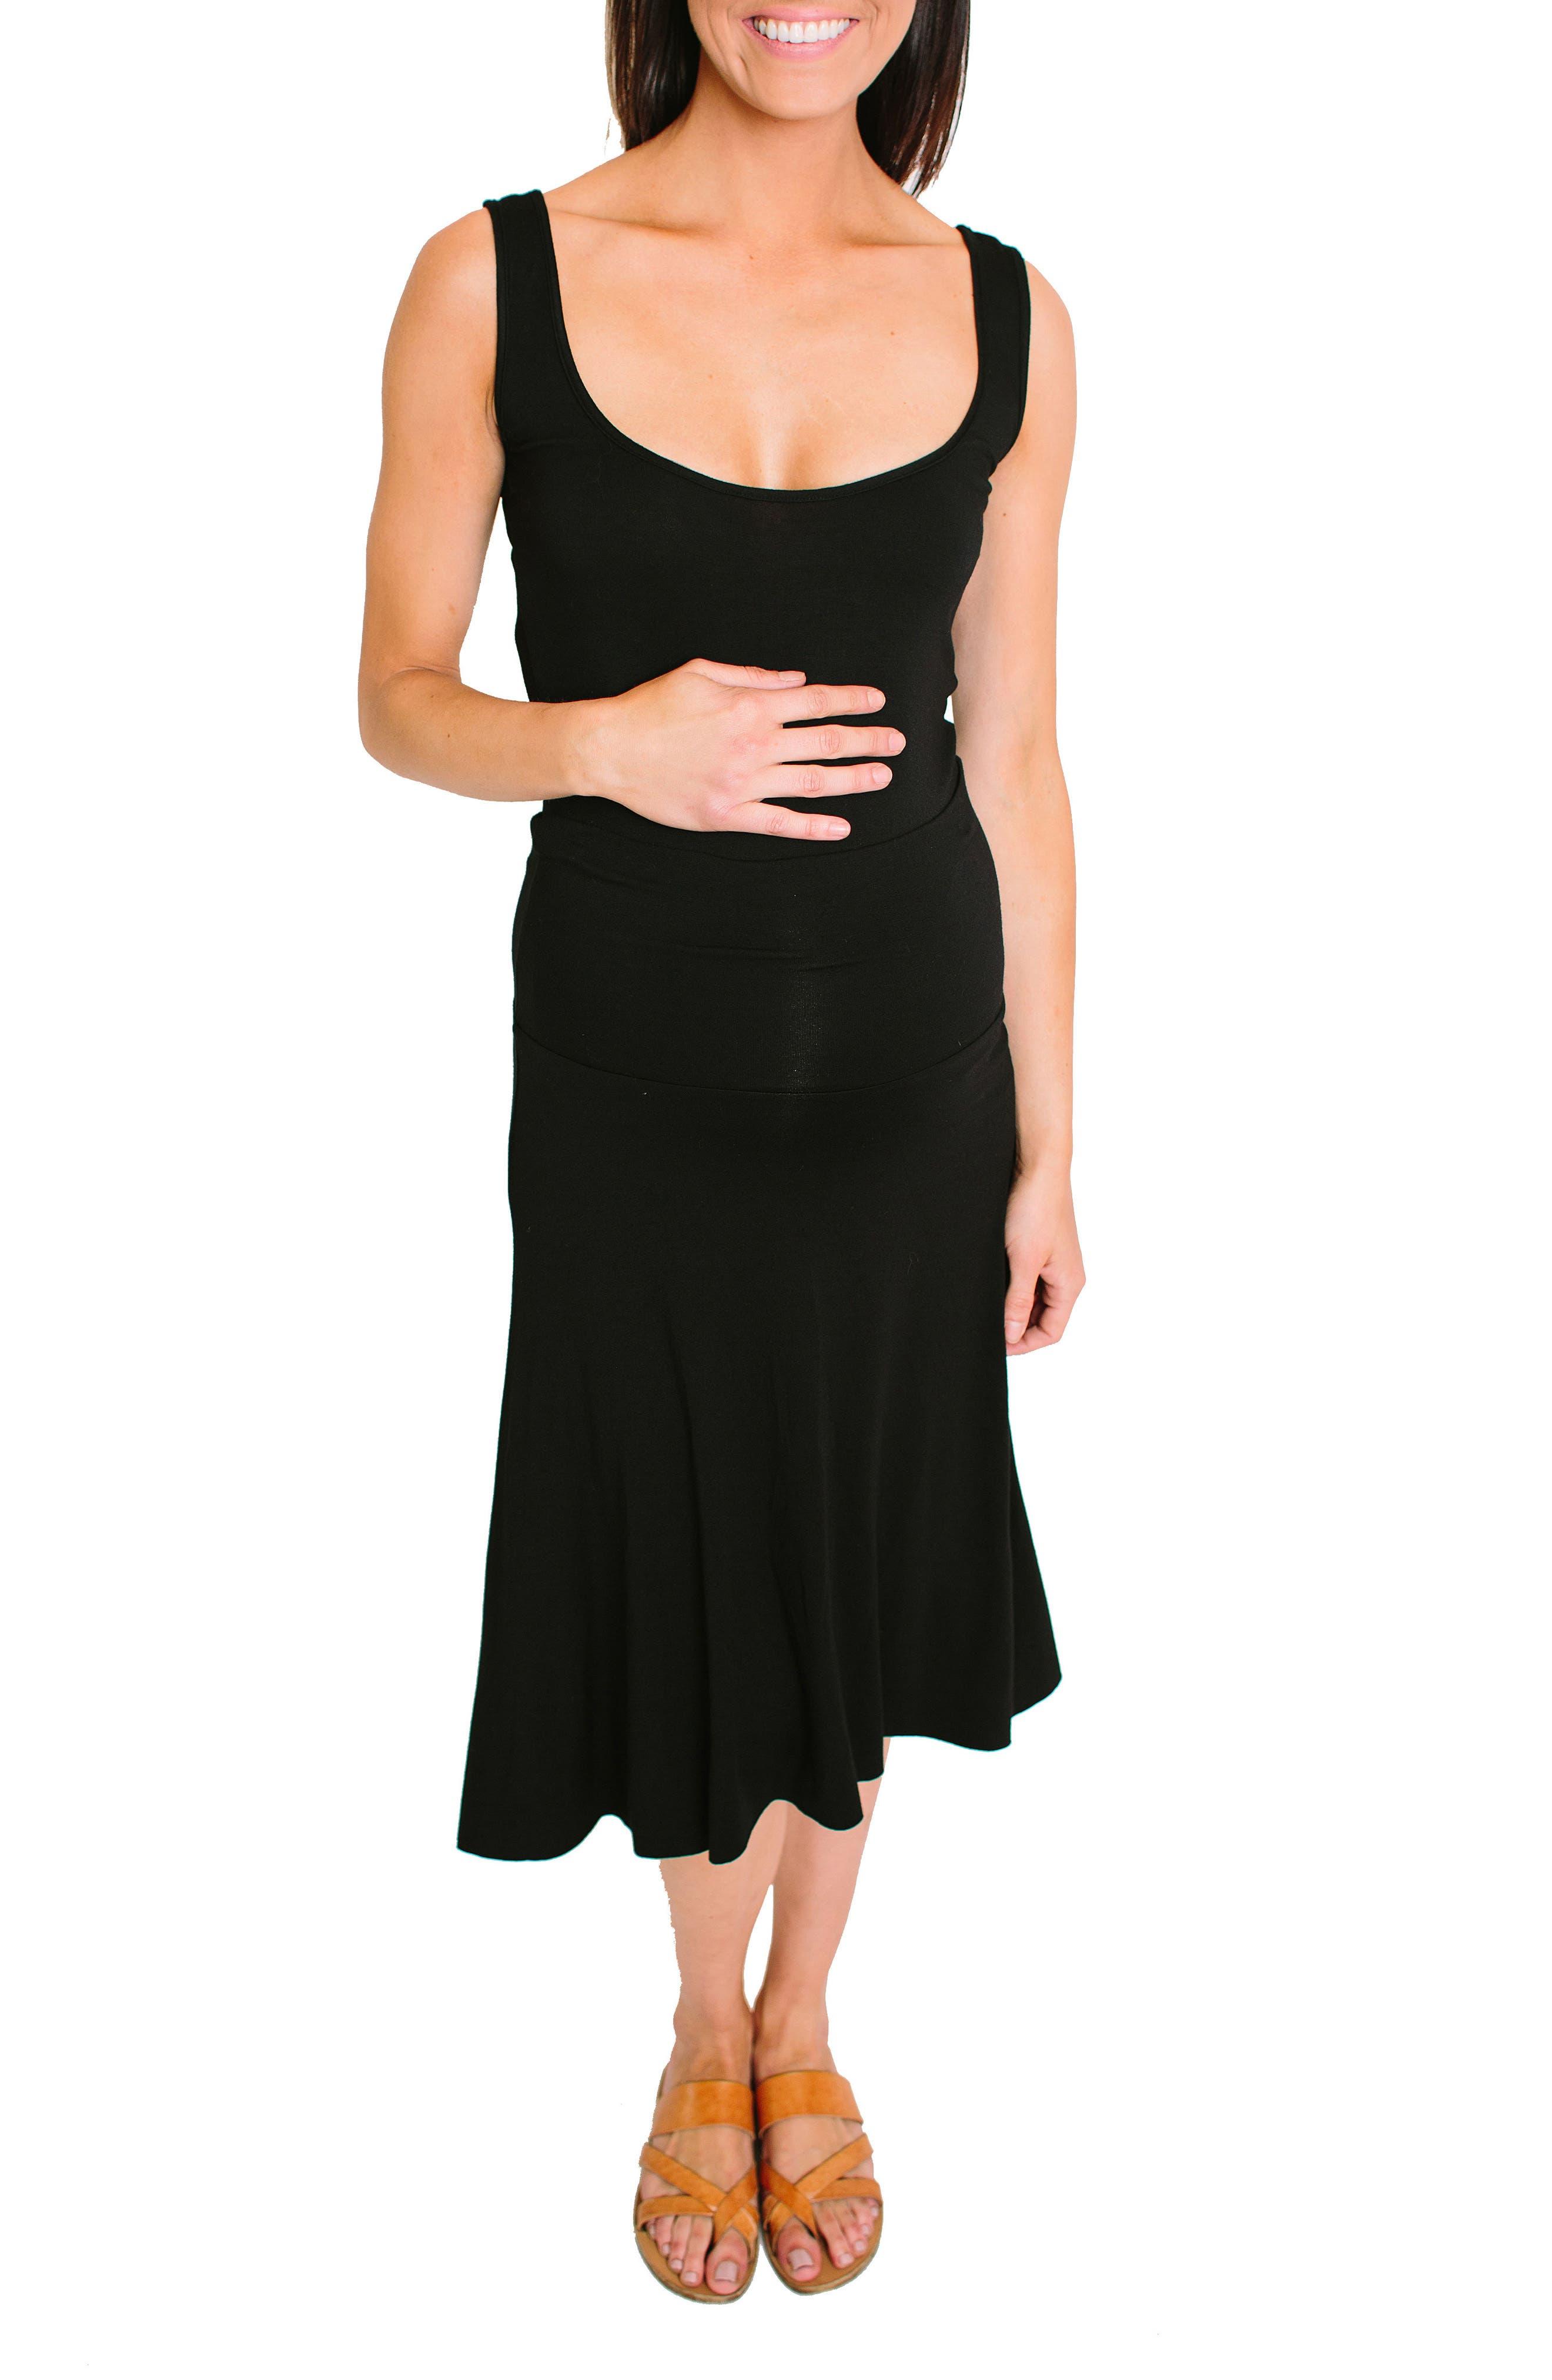 NOM Nola Maternity Skirt,                             Main thumbnail 1, color,                             BLACK